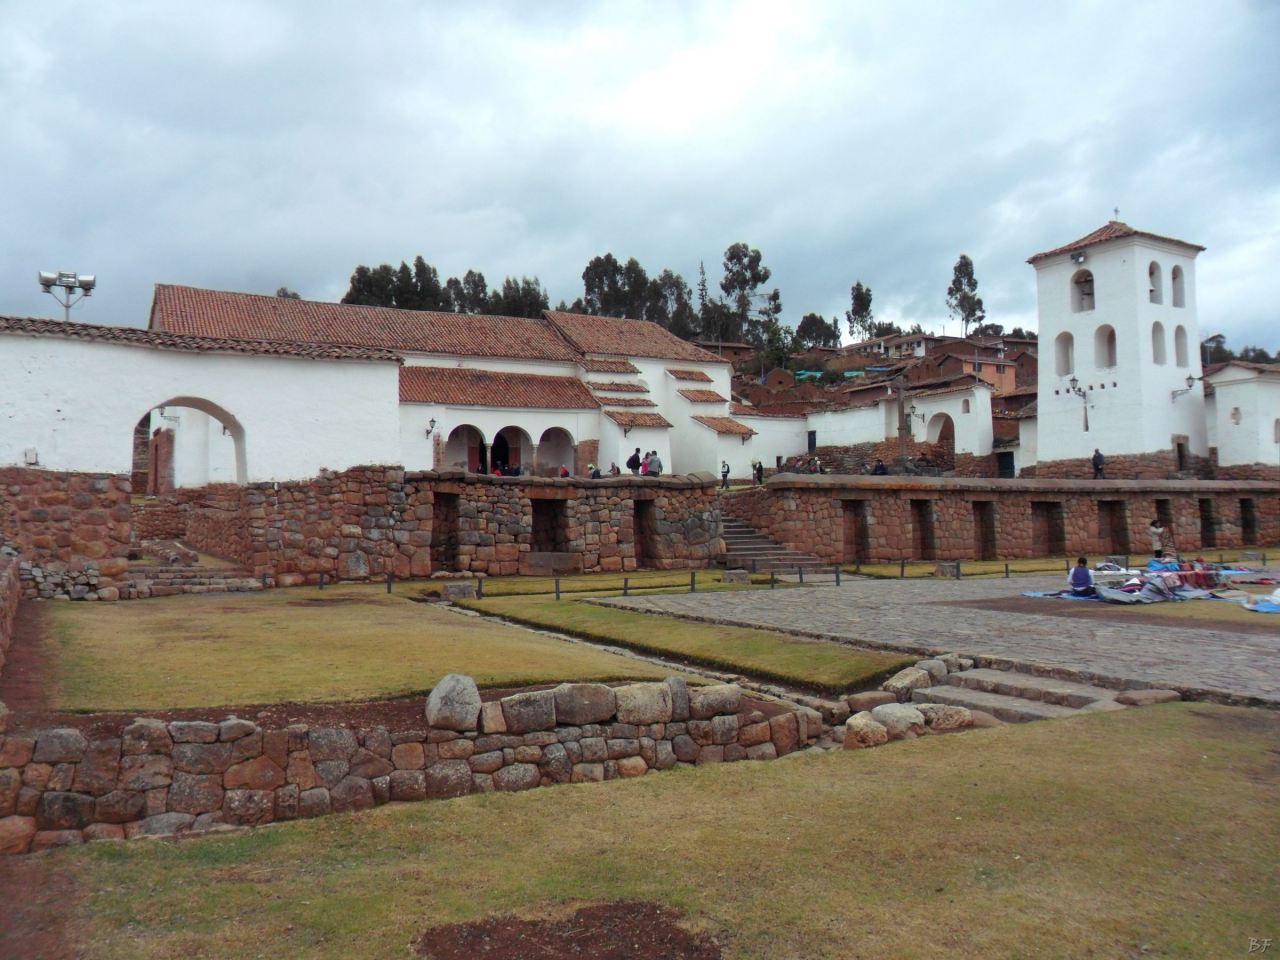 Chinchero-Mura-Poligonali-Piramide-Urubamba-Peru-22